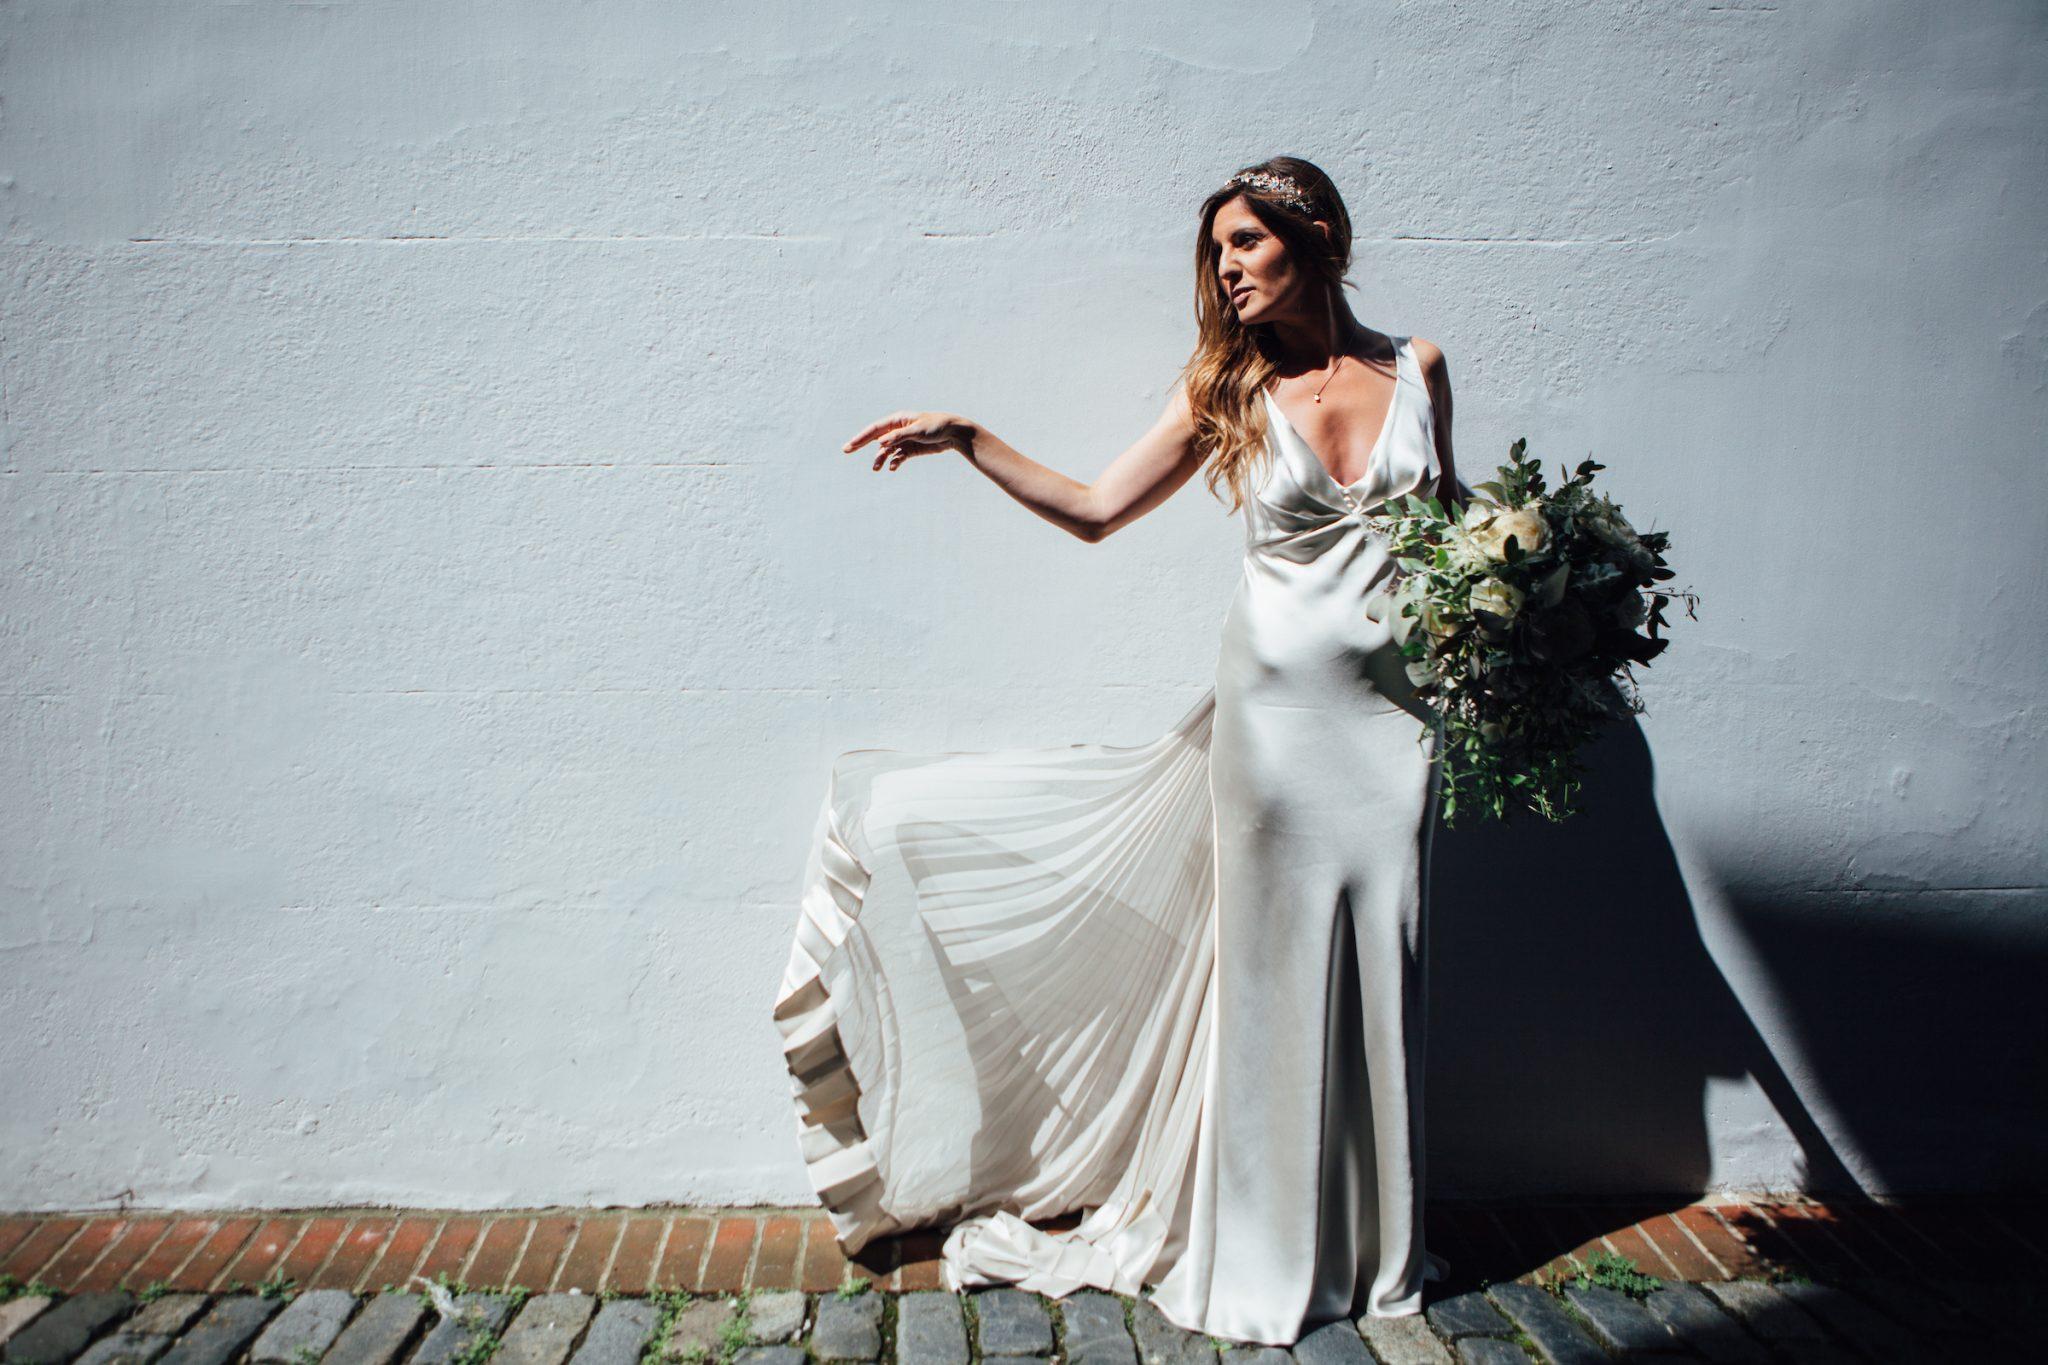 Brighton wedding photographer debut | Angel House Hove wedding